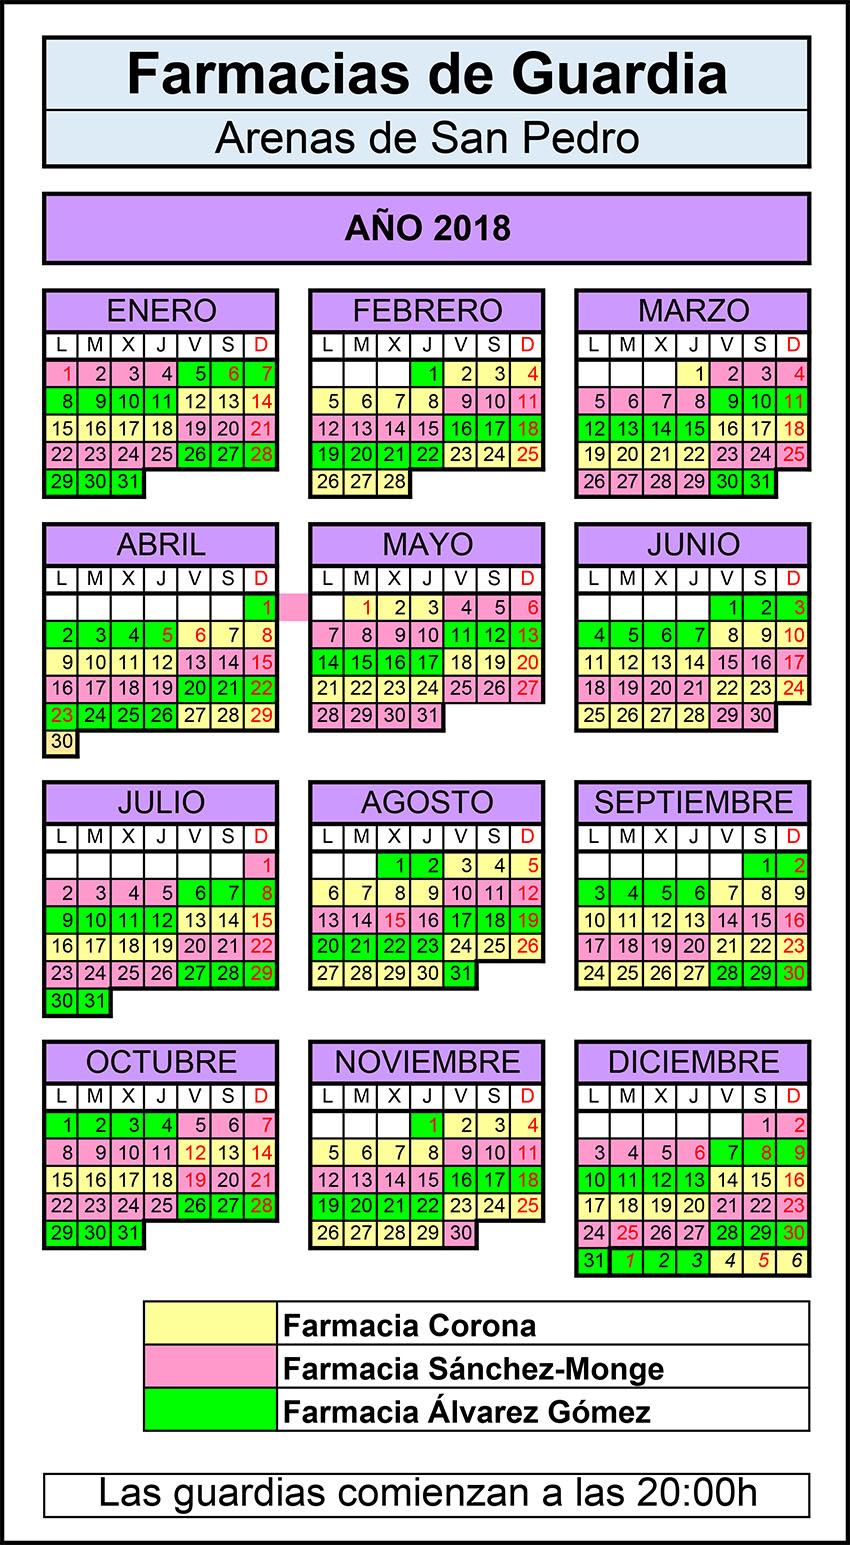 Calendario Farmacias de Guardia 2018 - Arenas de San Pedro - TiétarTeVe